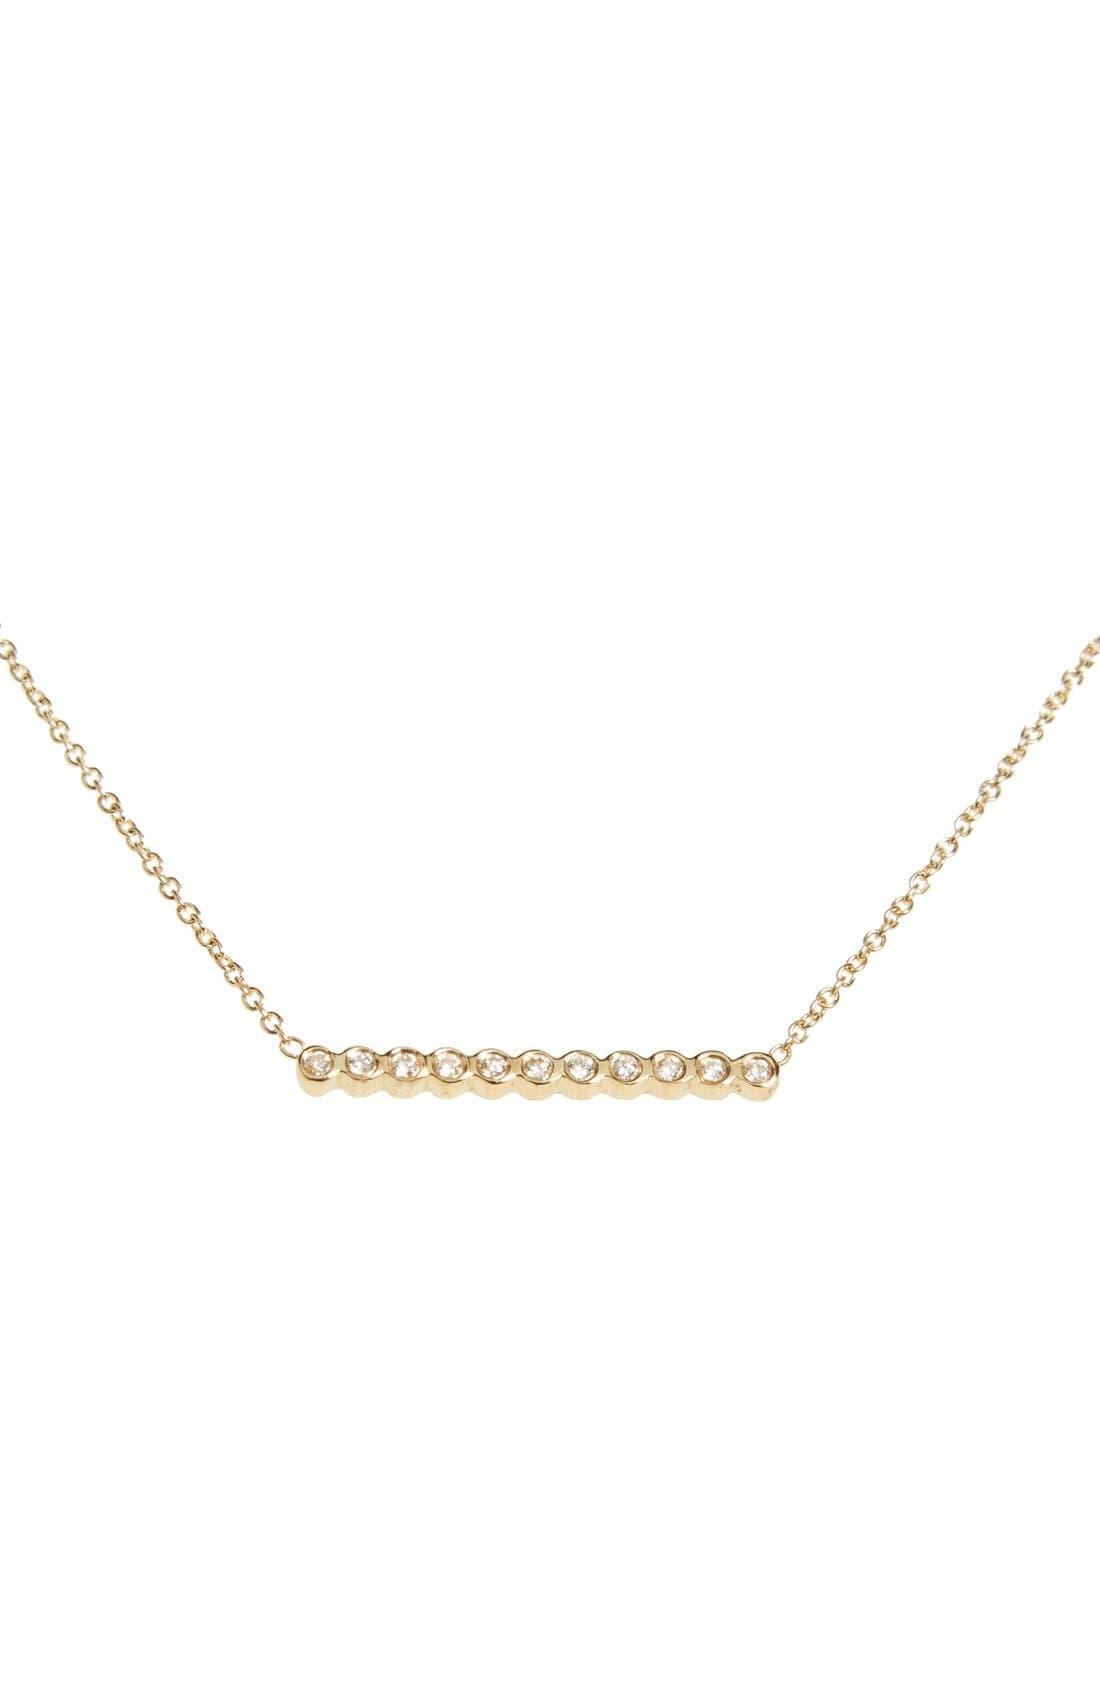 Zoë Chicco Diamond Bar Pendant Necklace